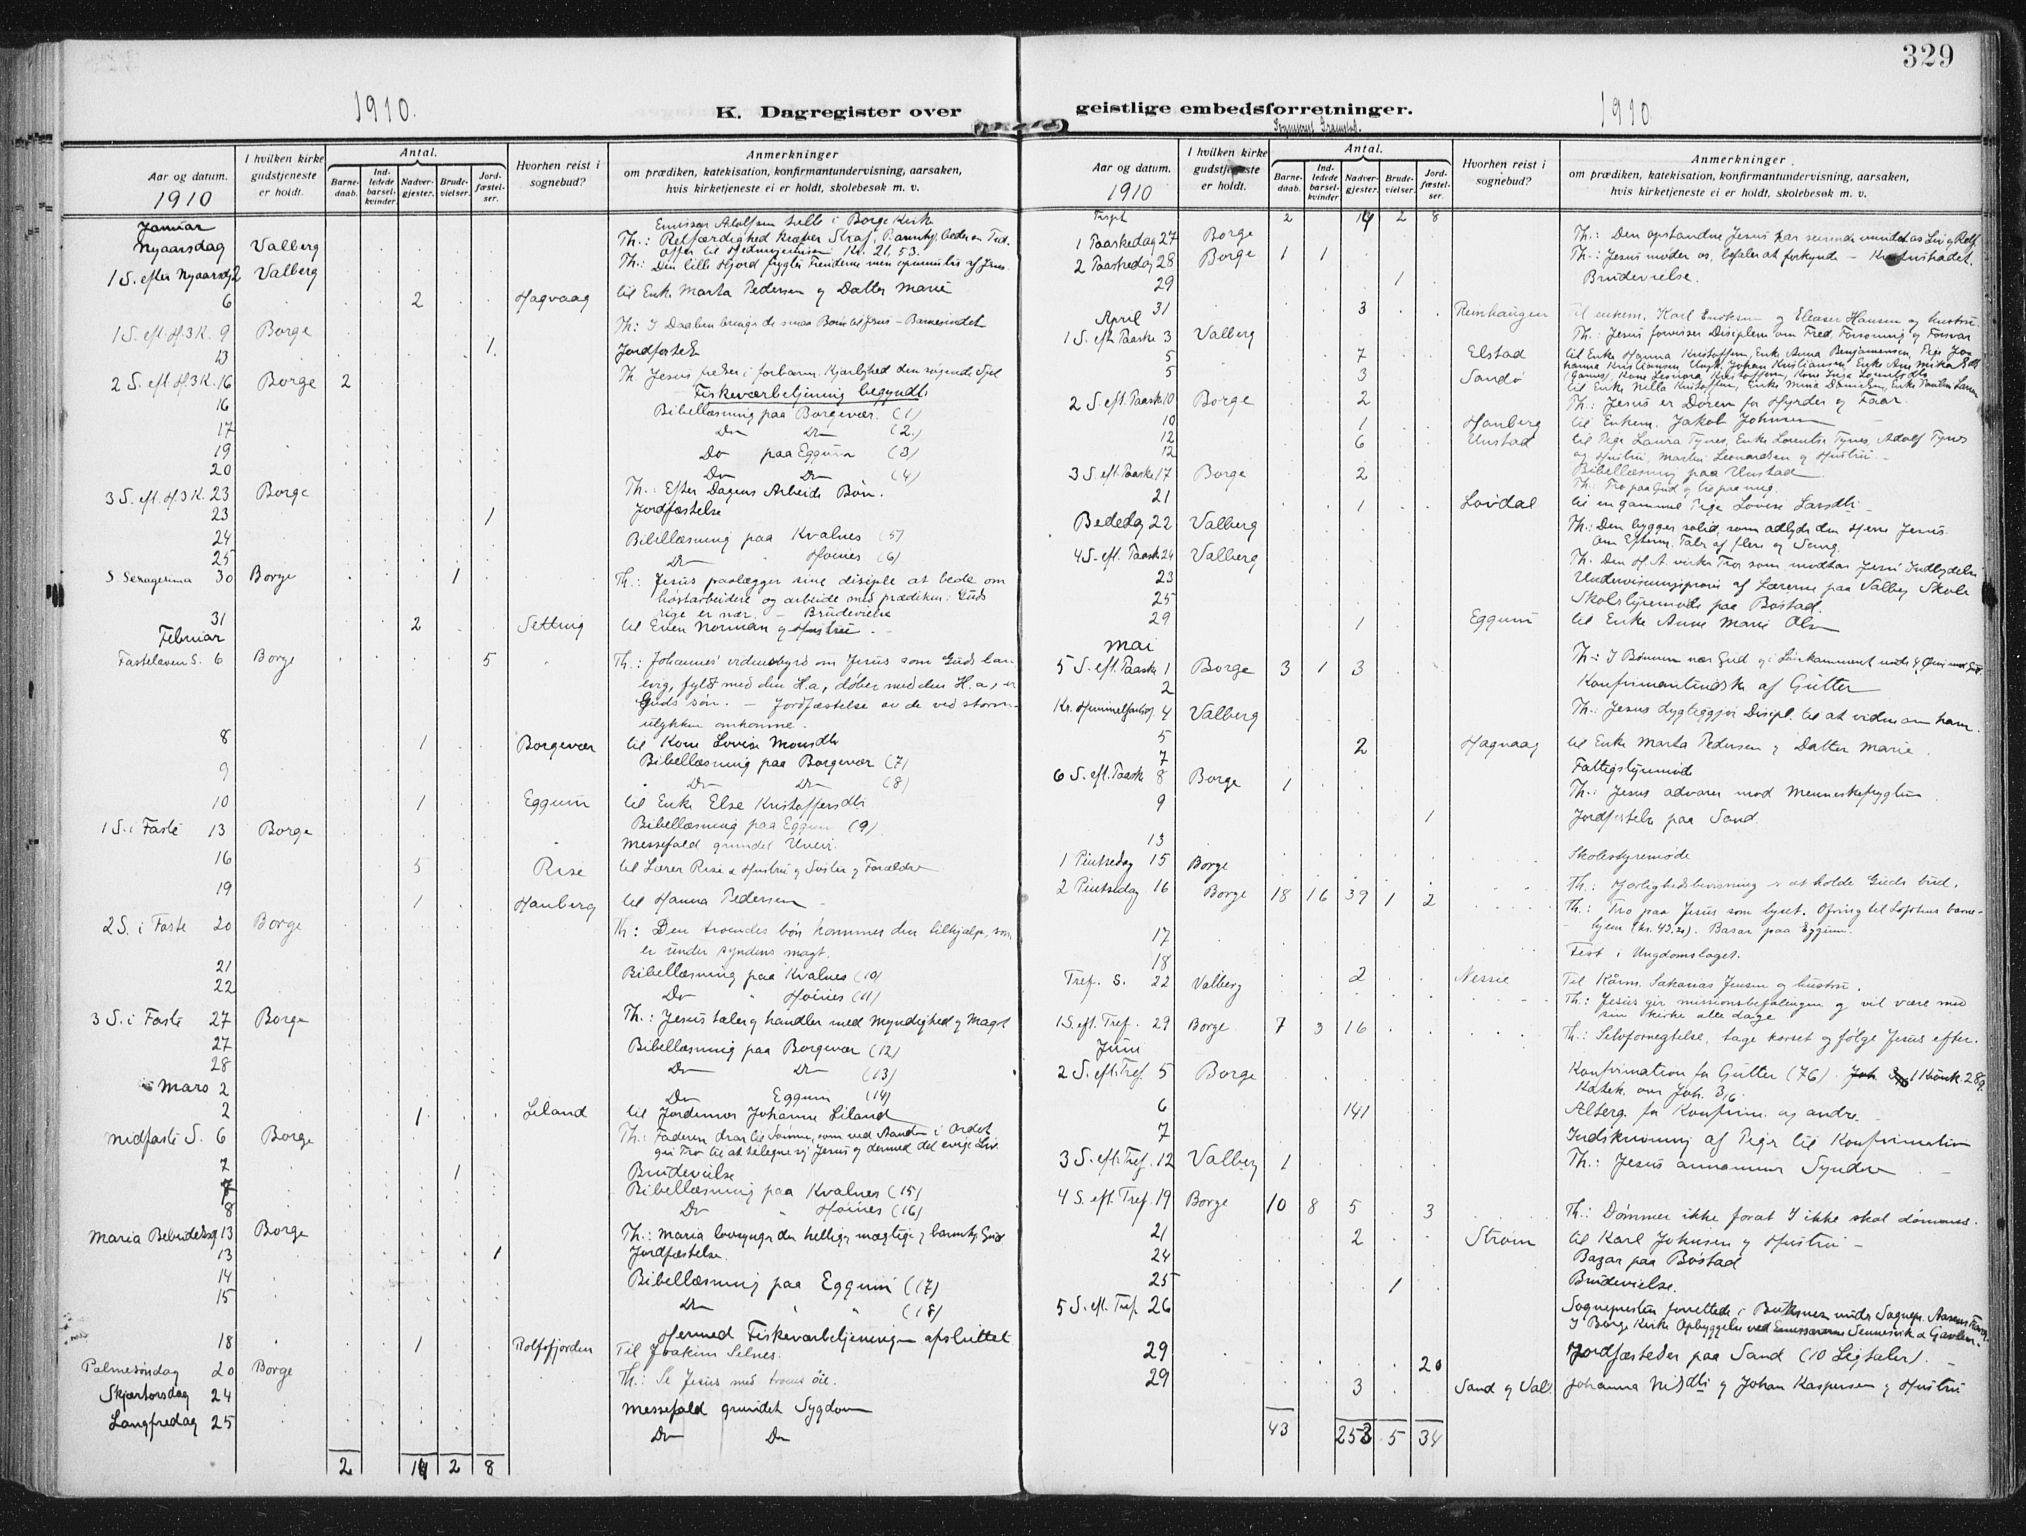 SAT, Ministerialprotokoller, klokkerbøker og fødselsregistre - Nordland, 880/L1135: Ministerialbok nr. 880A09, 1908-1919, s. 329